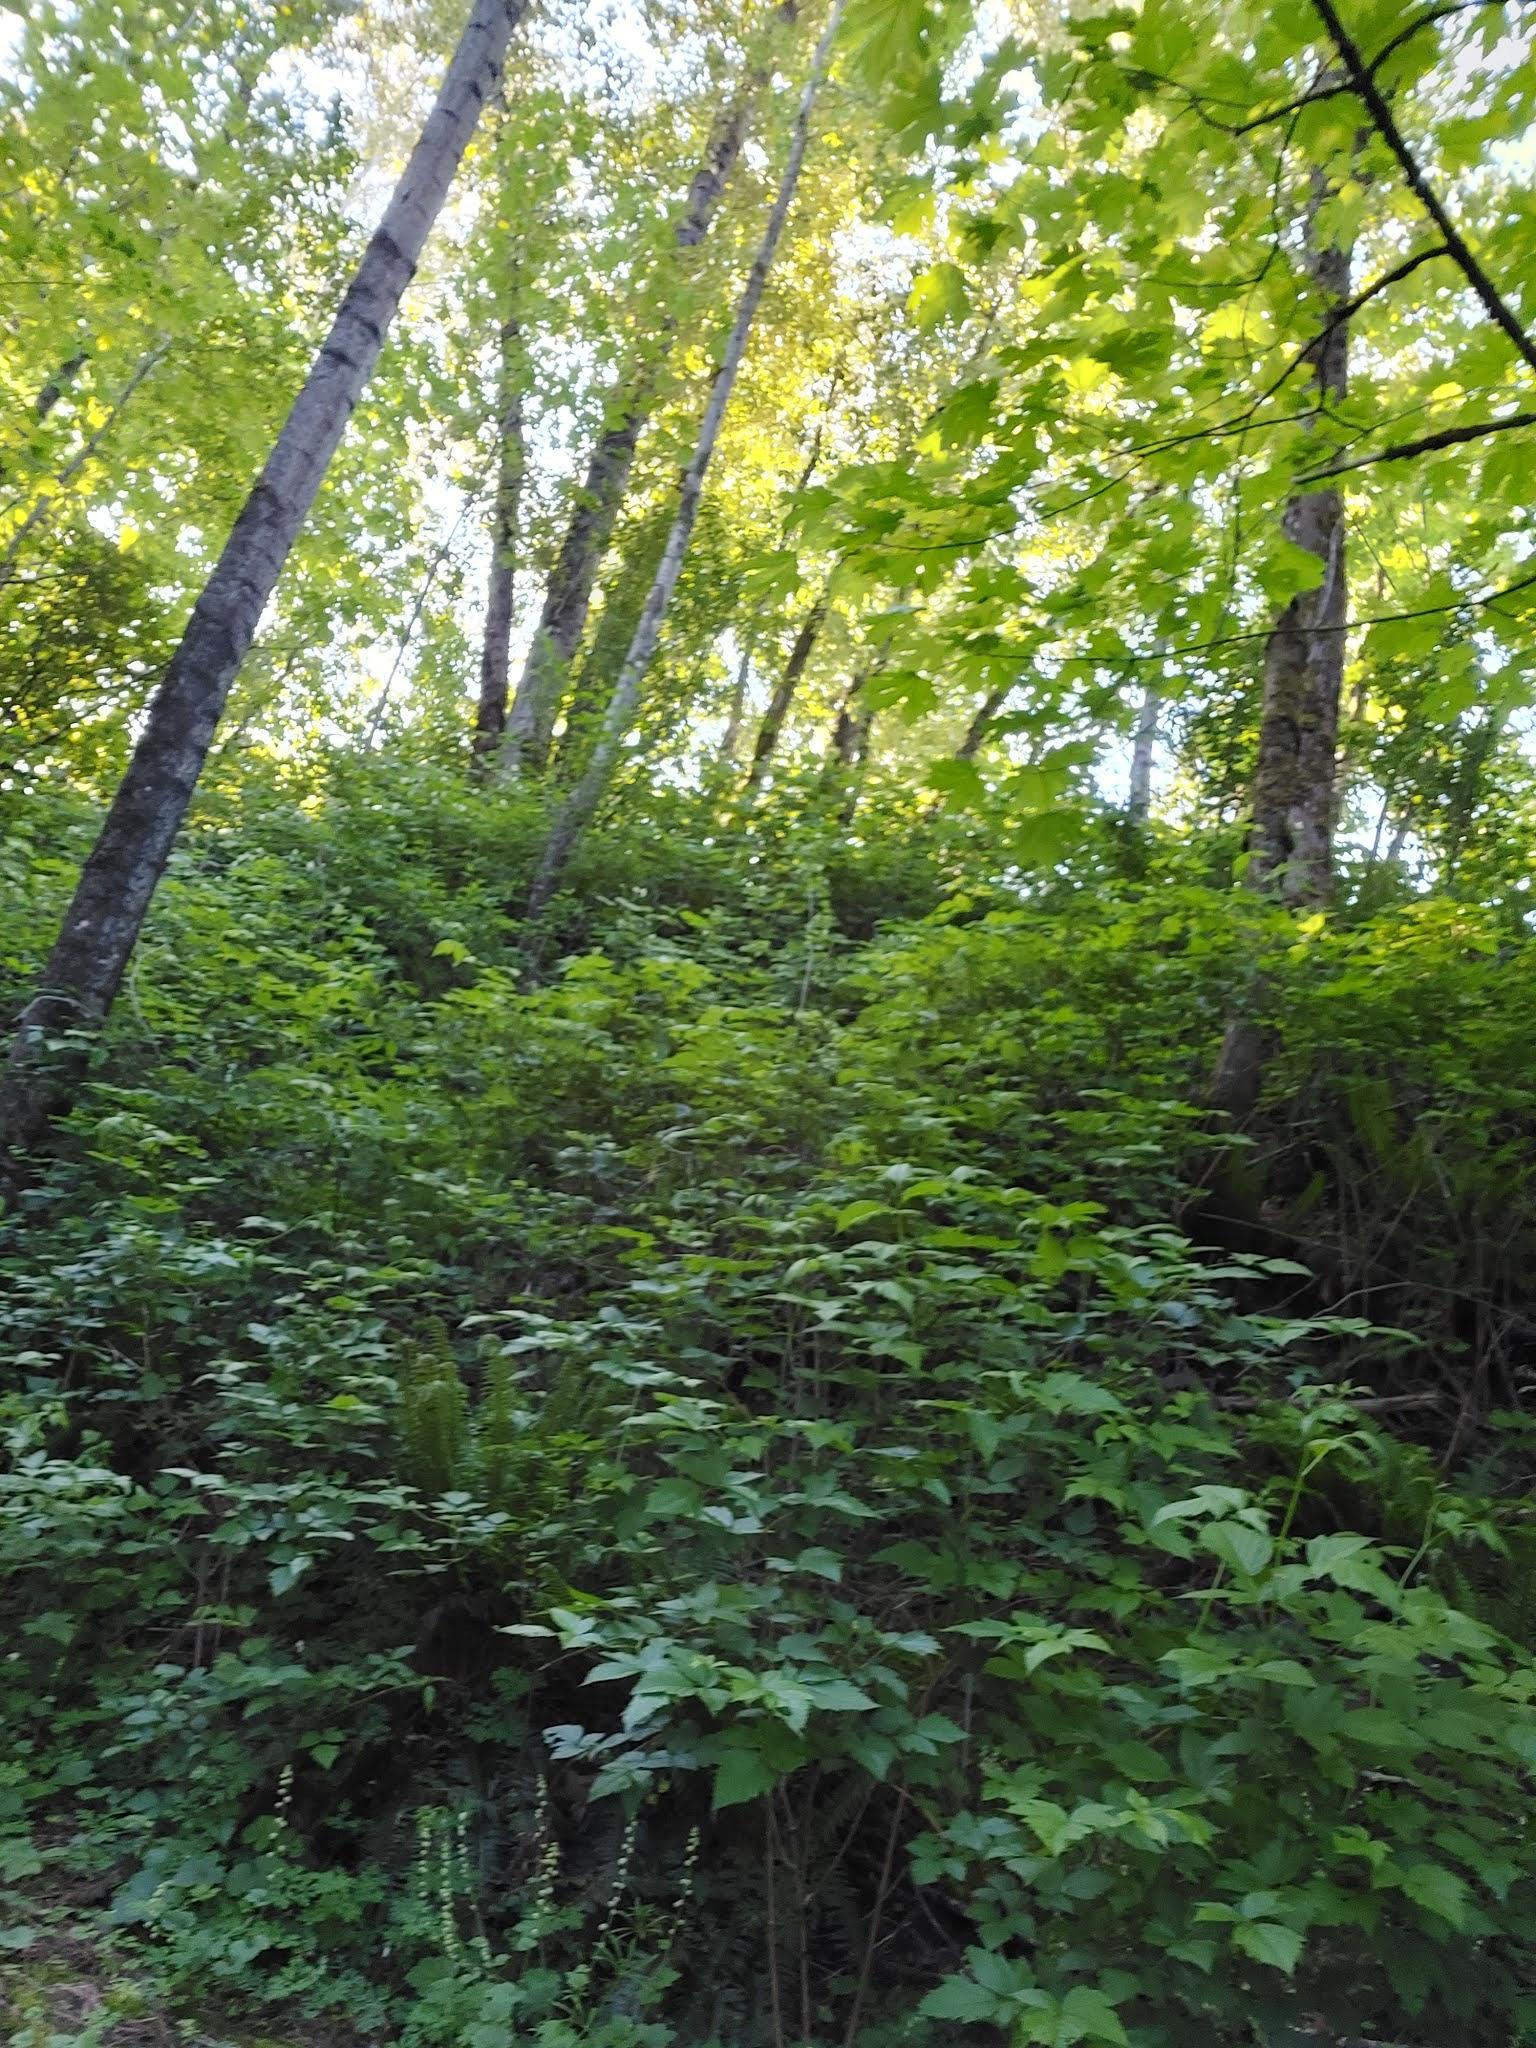 Forest lush green sorounding